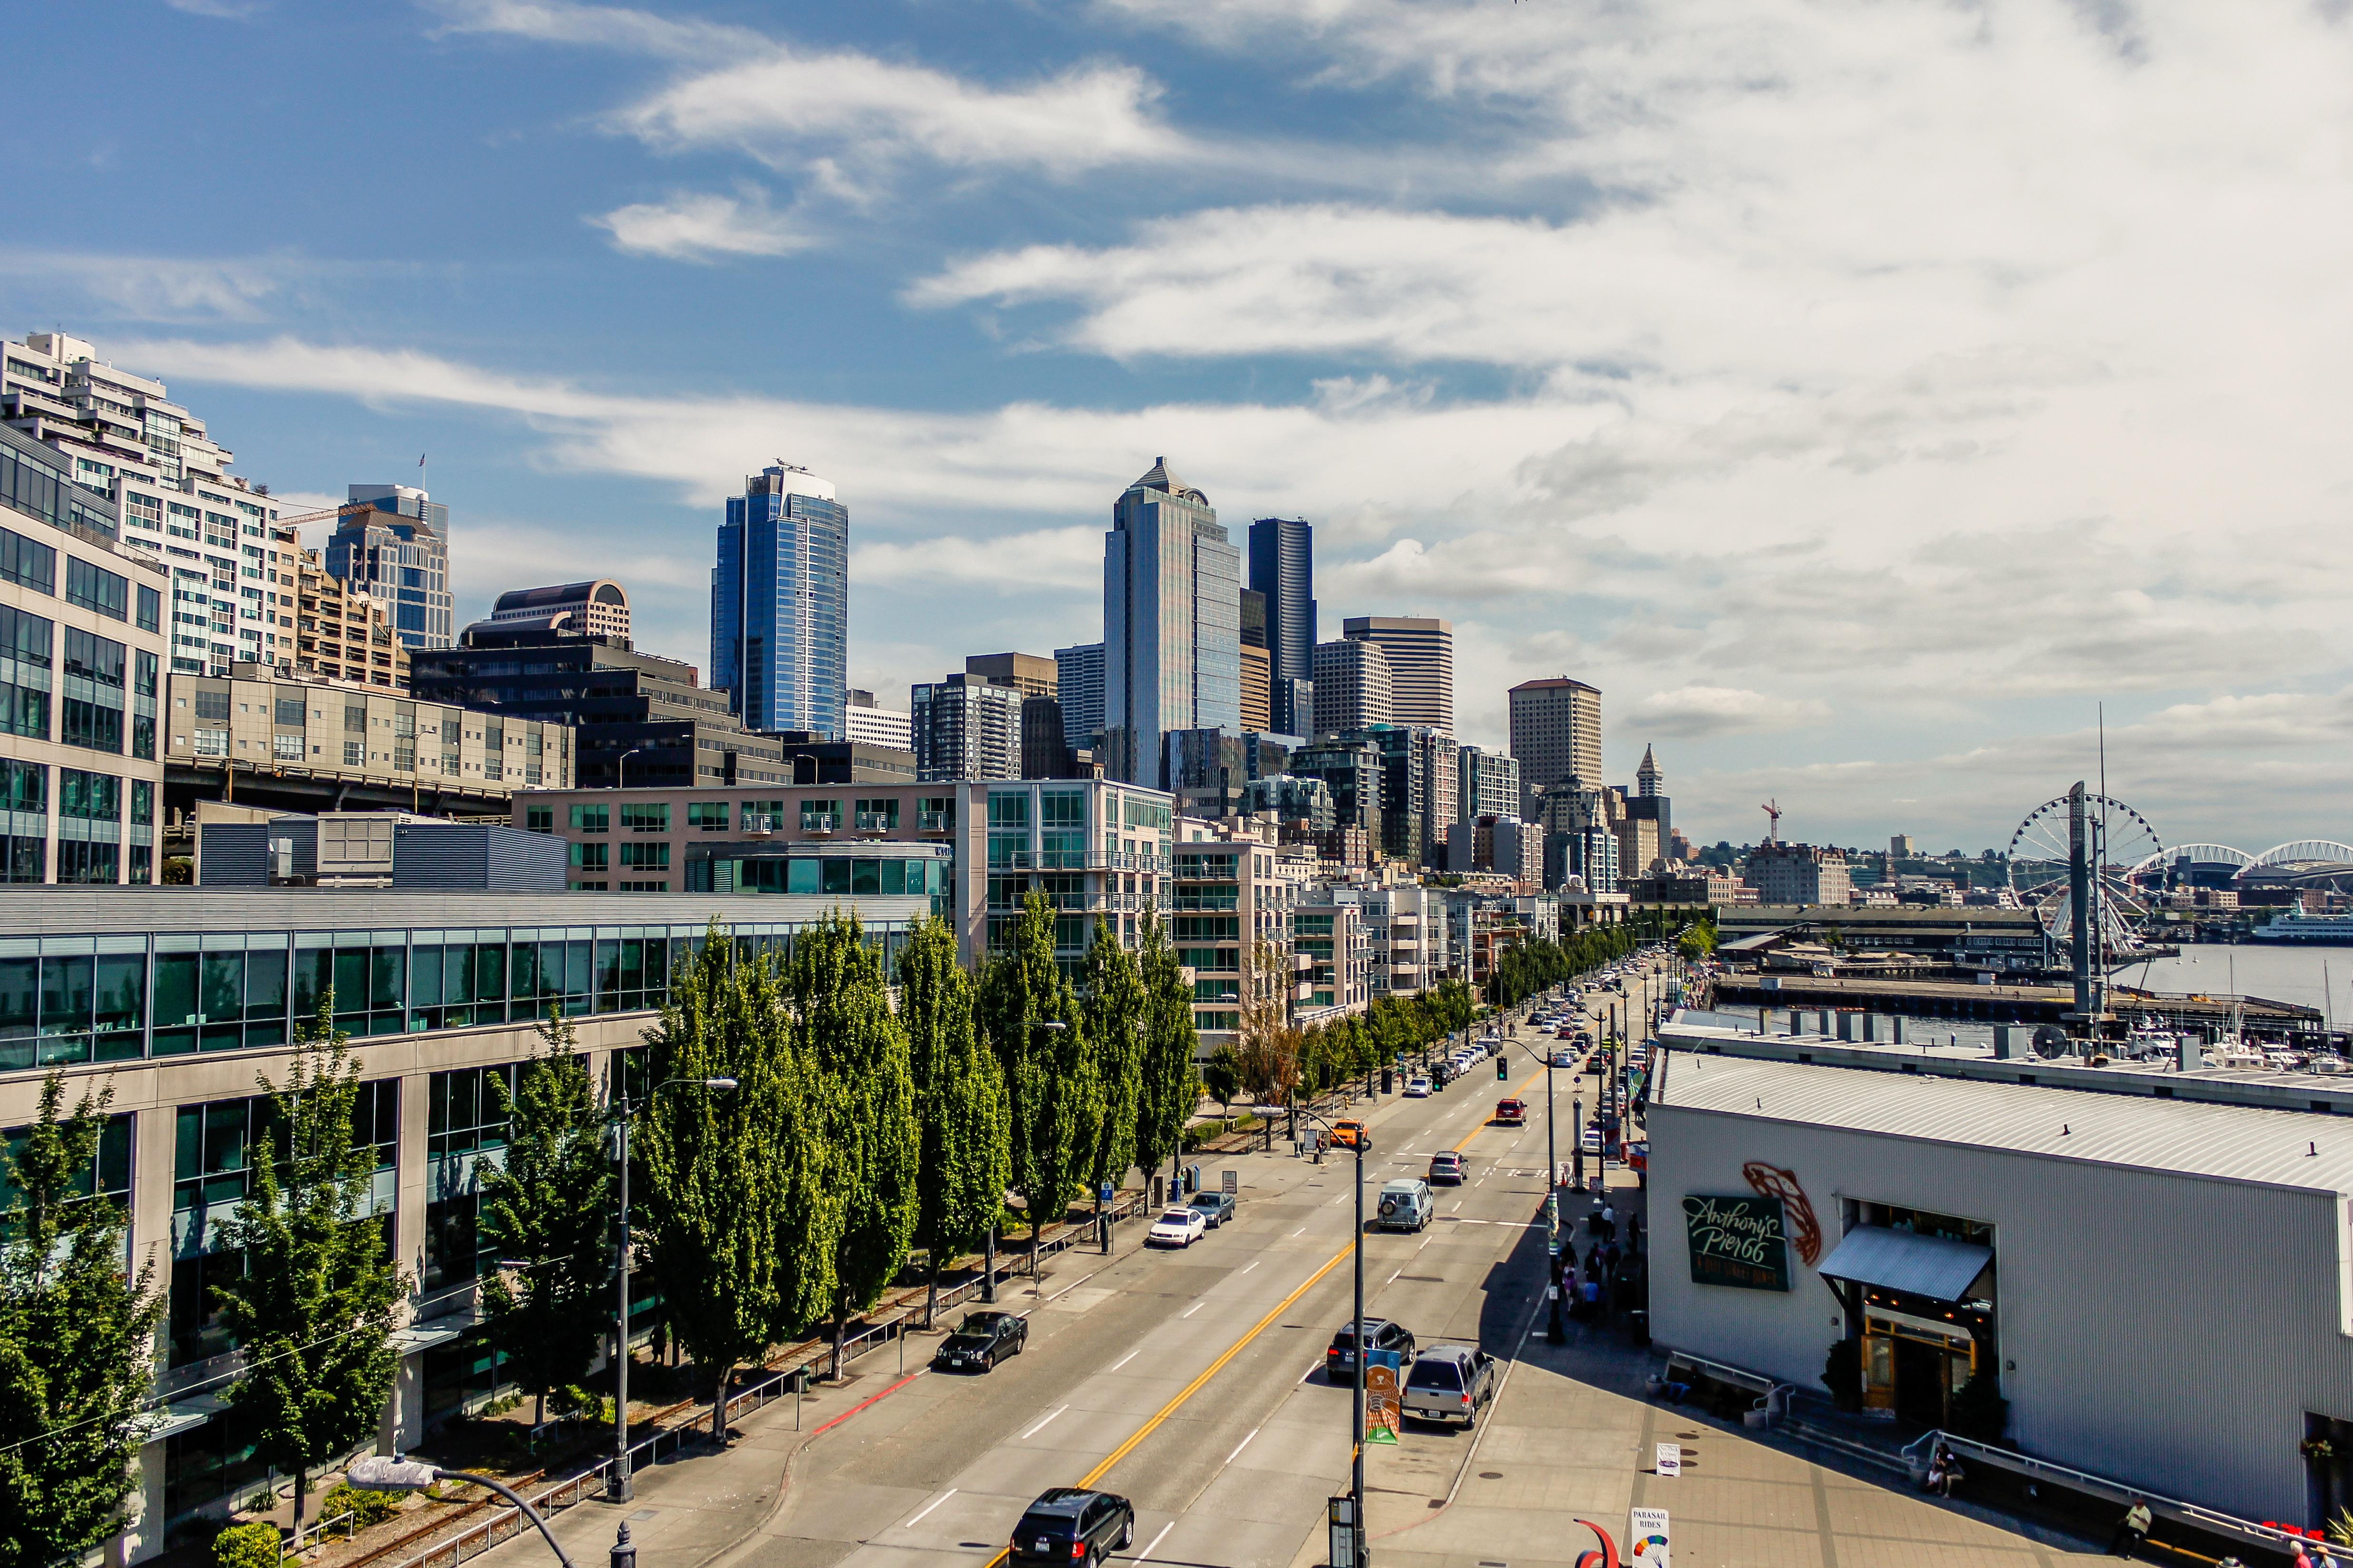 Seattle Waterfront, Washington